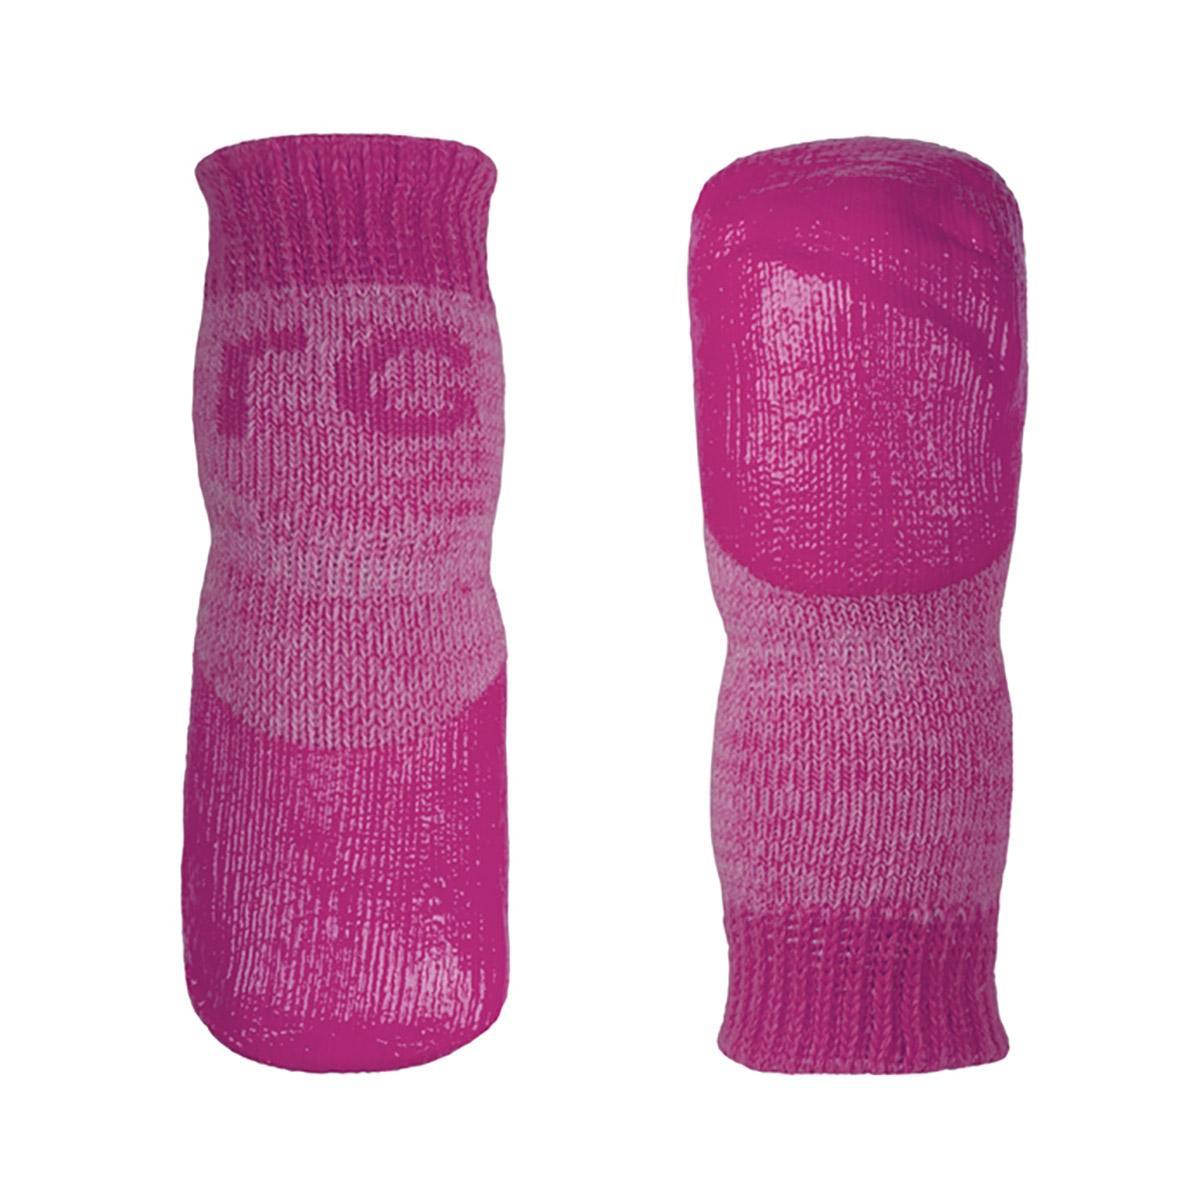 Sport PAWks Dog Socks - Mulberry Heather